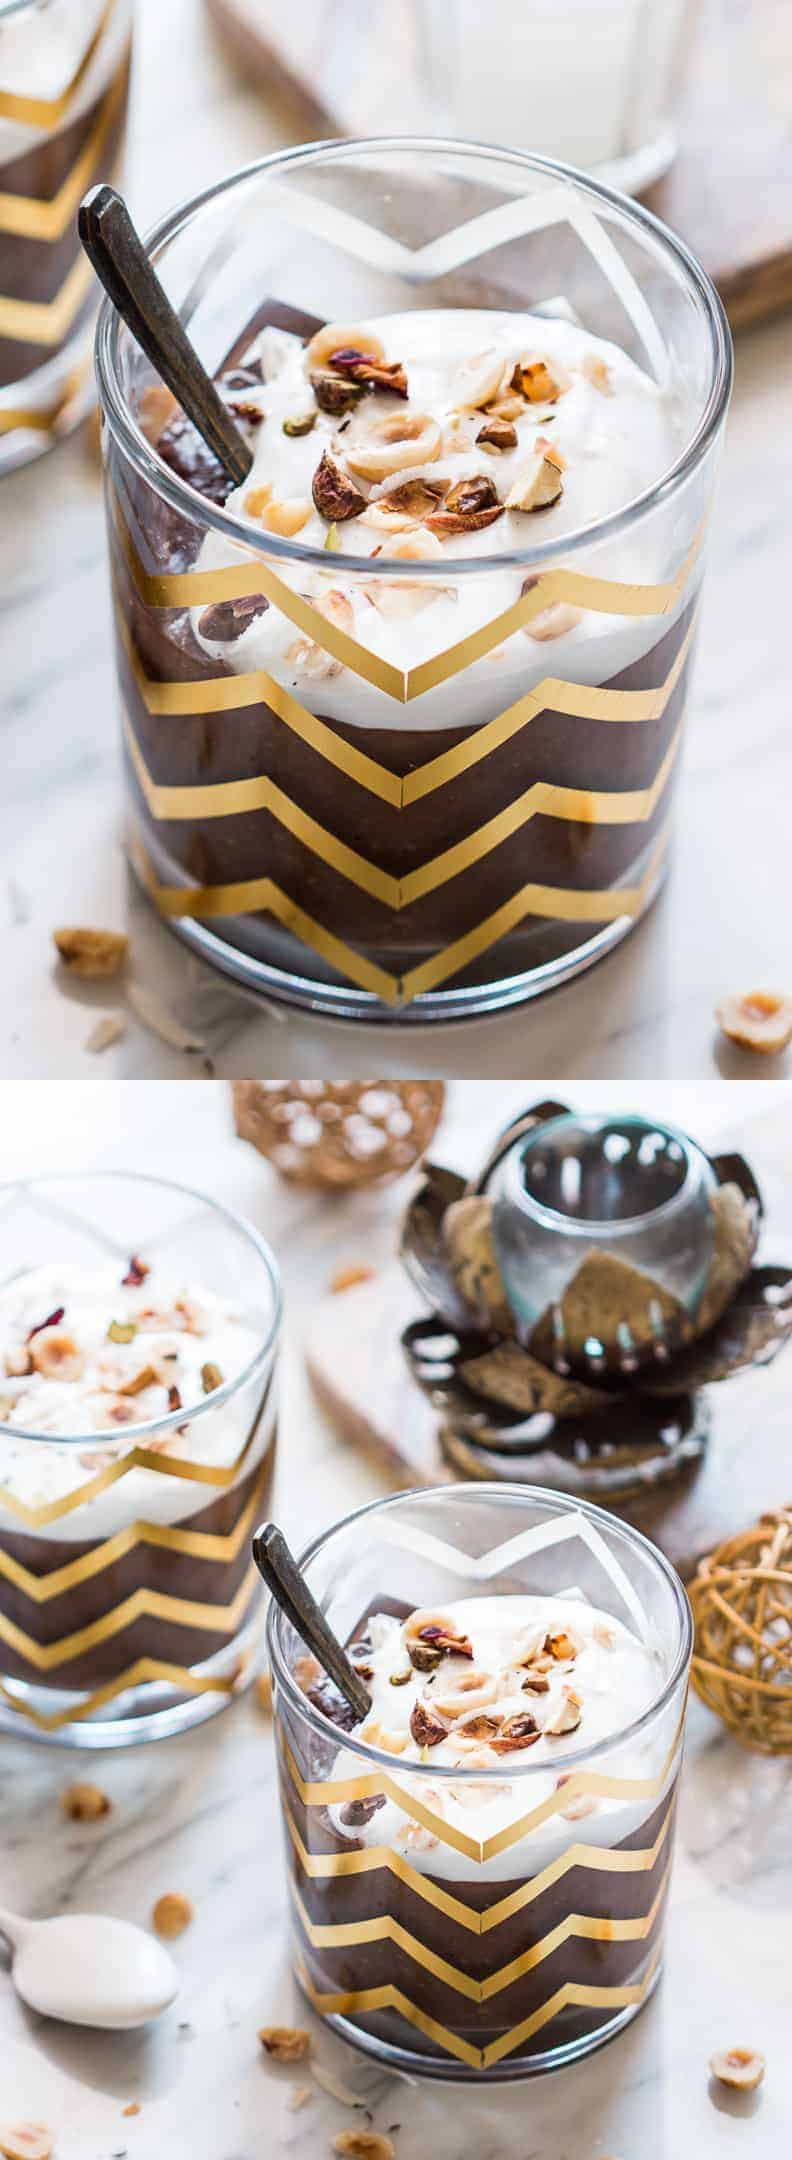 Festive Chocolate Rice Kheer (Pudding)